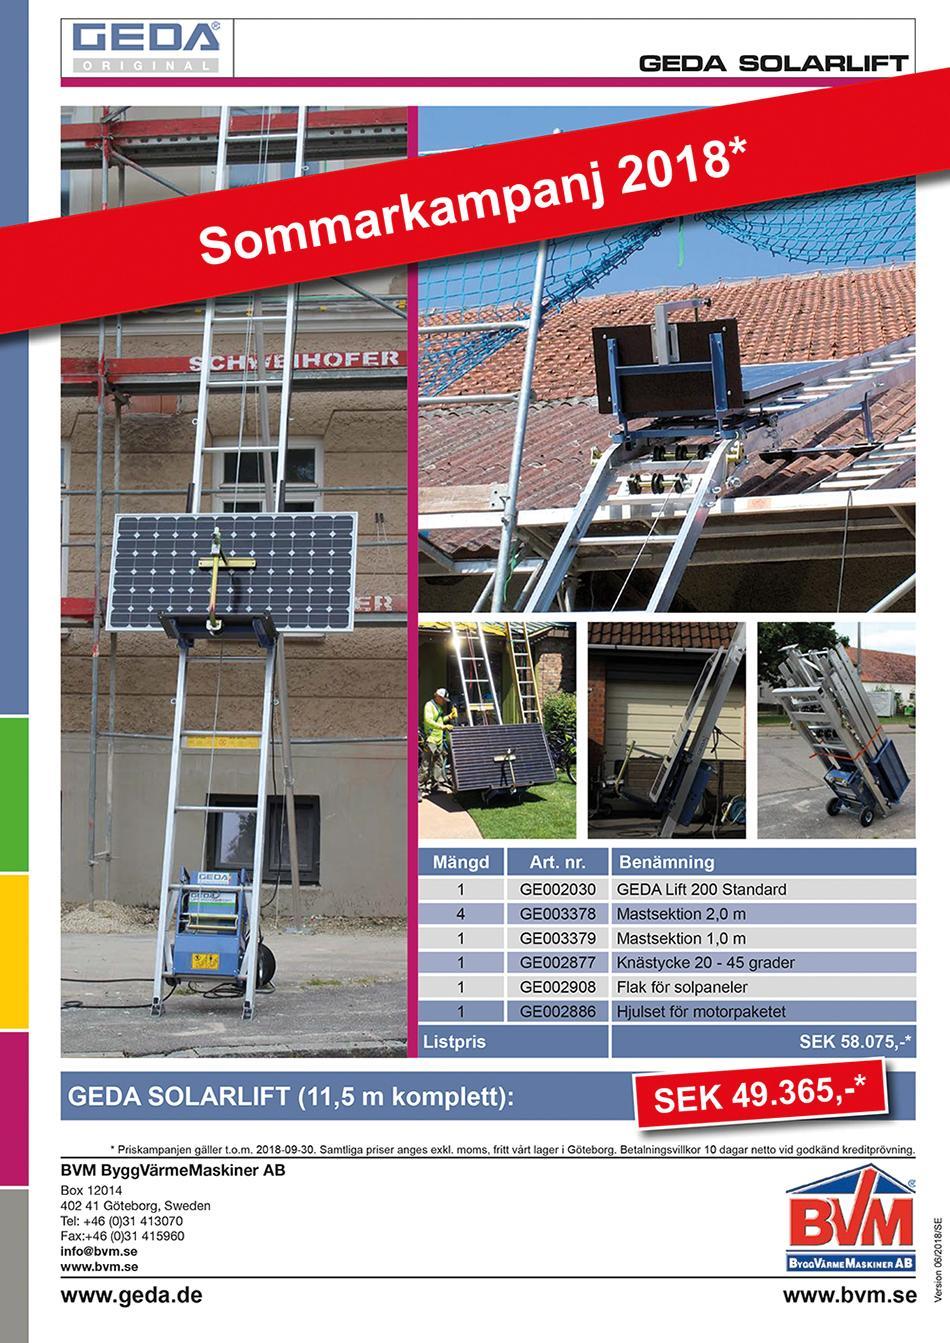 Sommarkampanj 2018 GEDA Solarlift